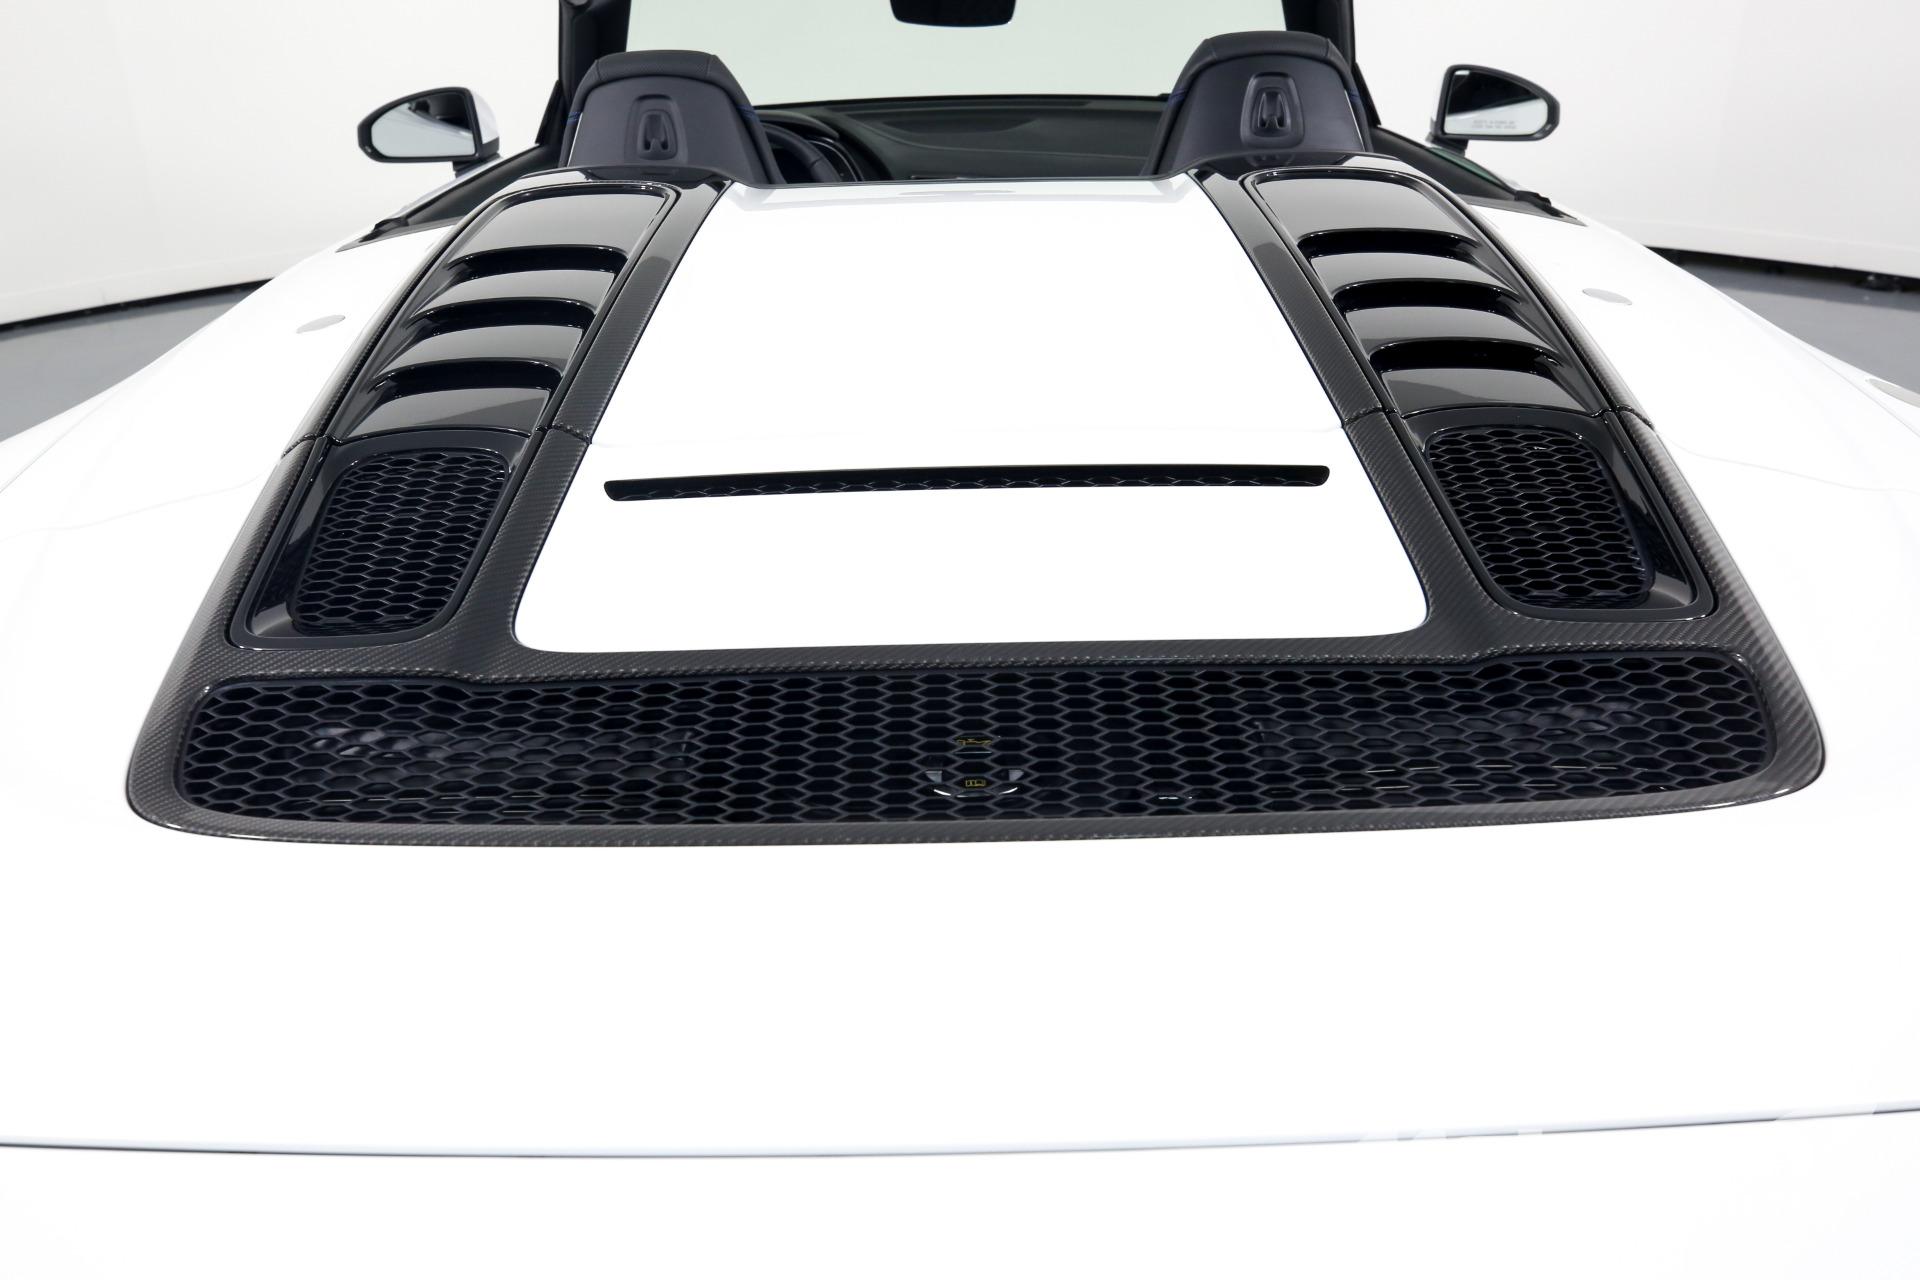 Used 2020 Audi R8 5.2 quattro V10 Spyder | Charlotte, NC